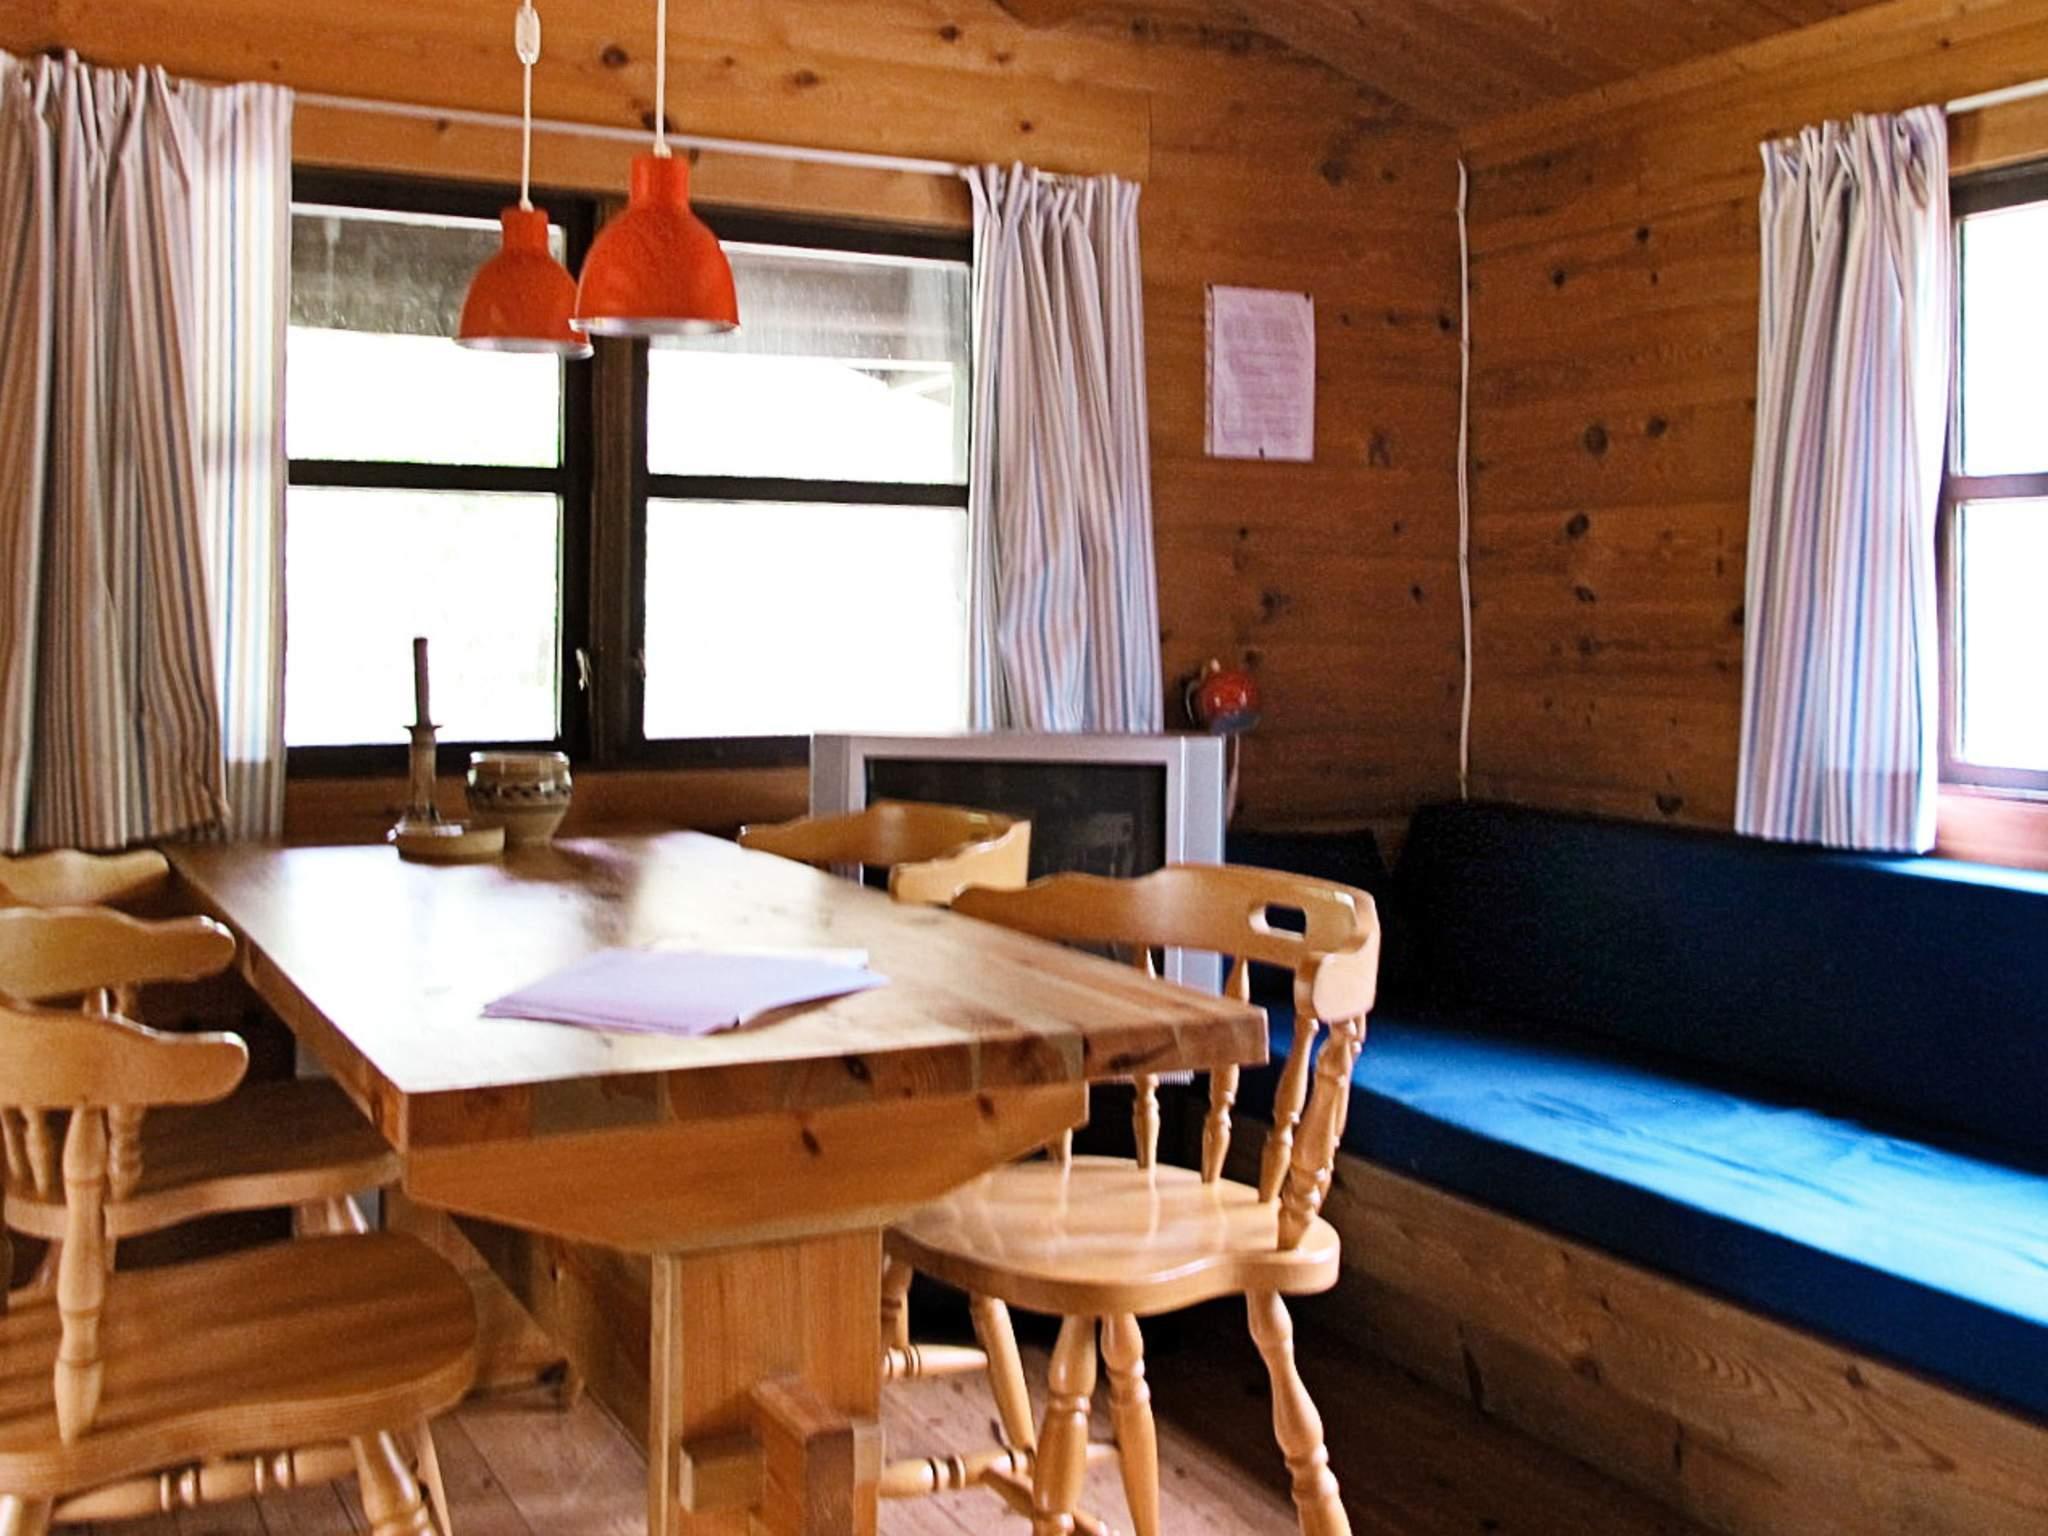 Ferienhaus Læsø/Vesterø (88192), Læsø, , Læsø, Dänemark, Bild 2